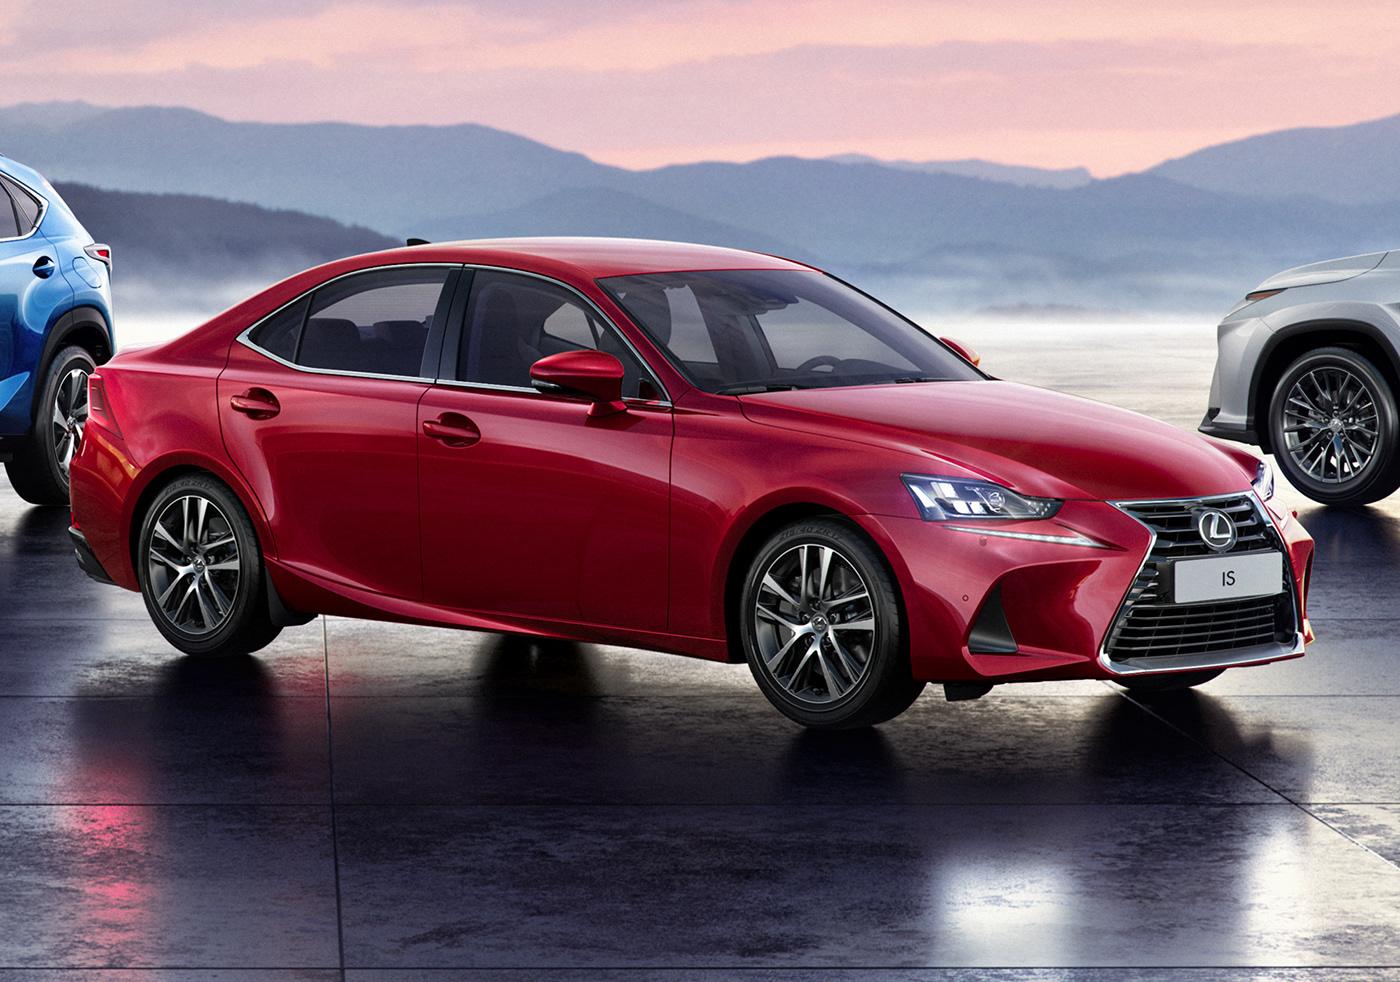 CGI Lexus corona Render advertisement